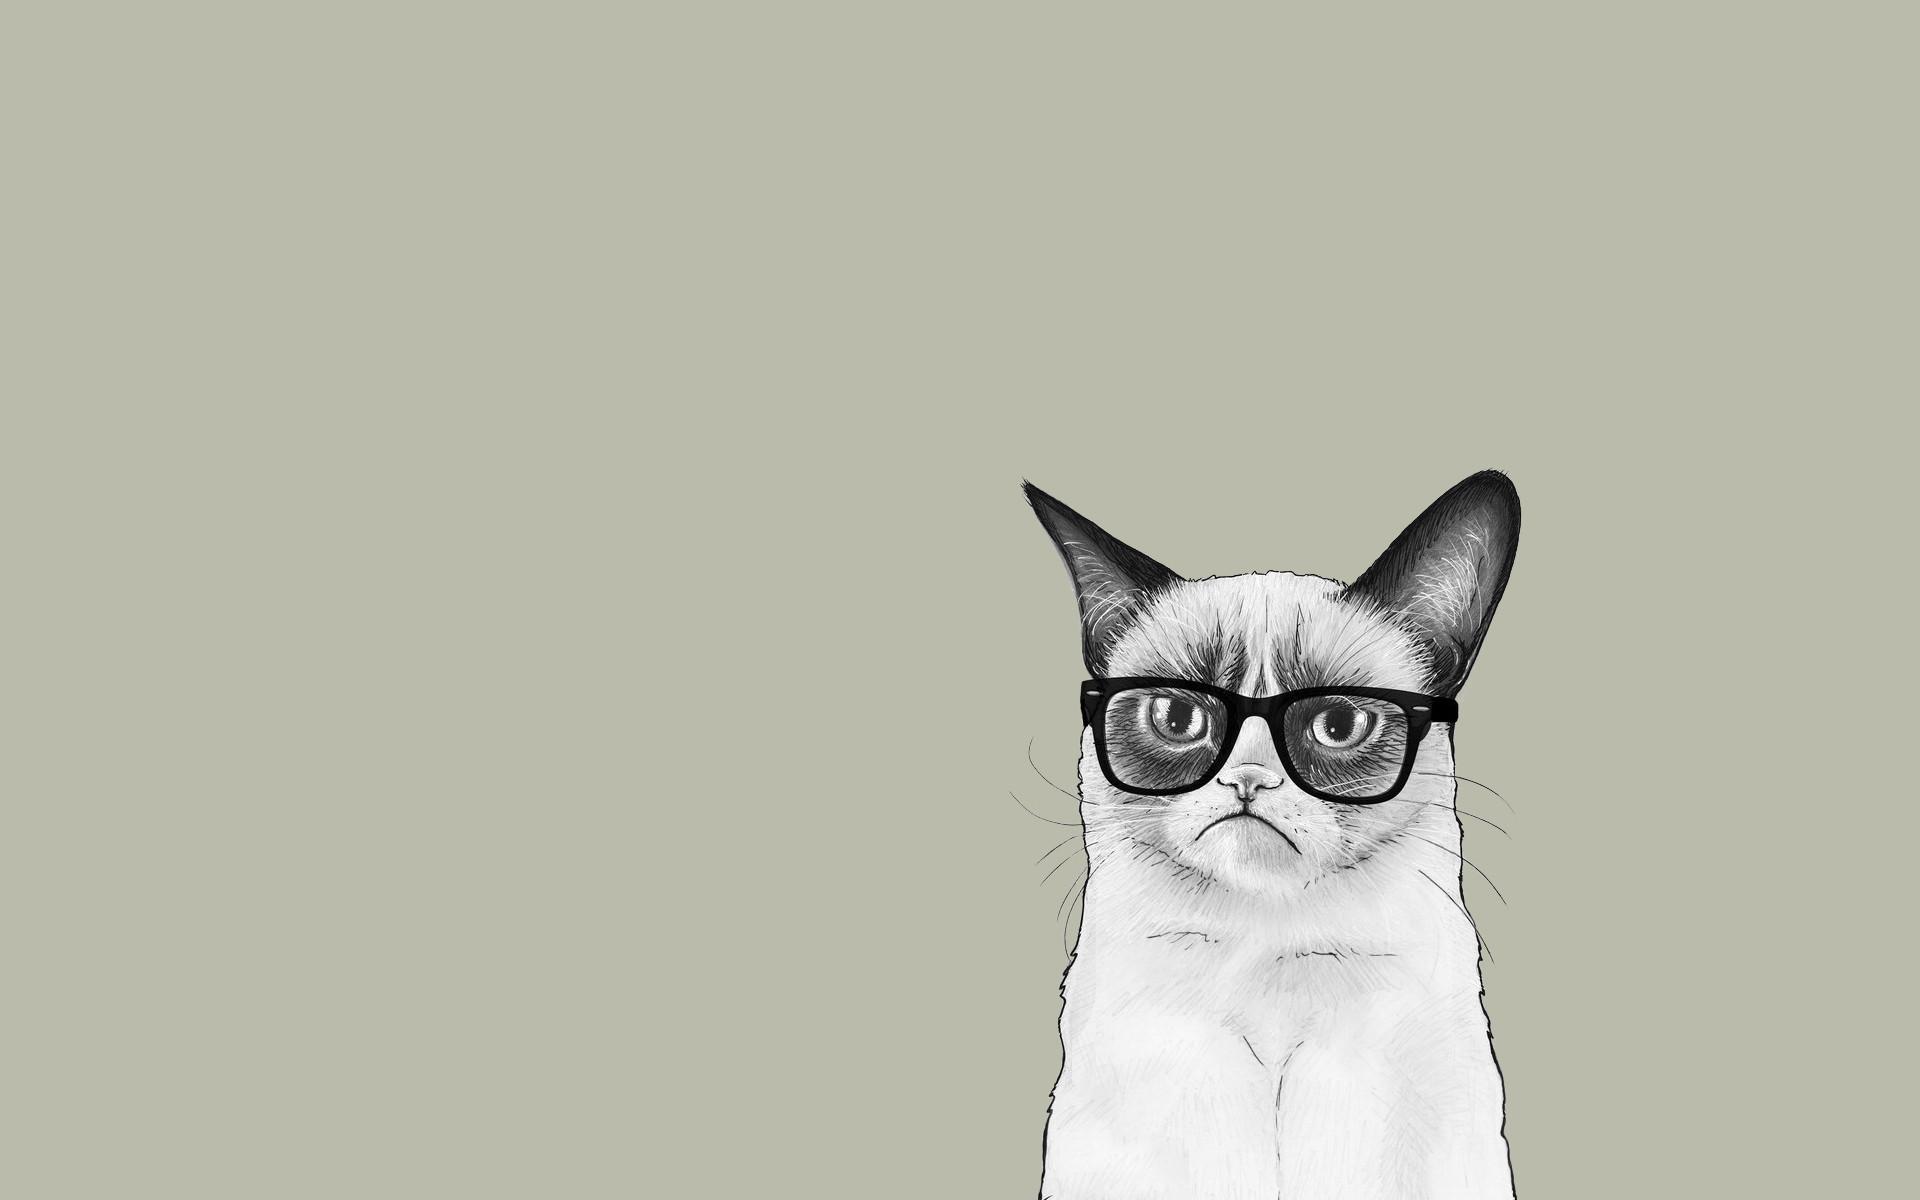 2048x1280 Grumpy Cat Wallpapers HD 61 Images